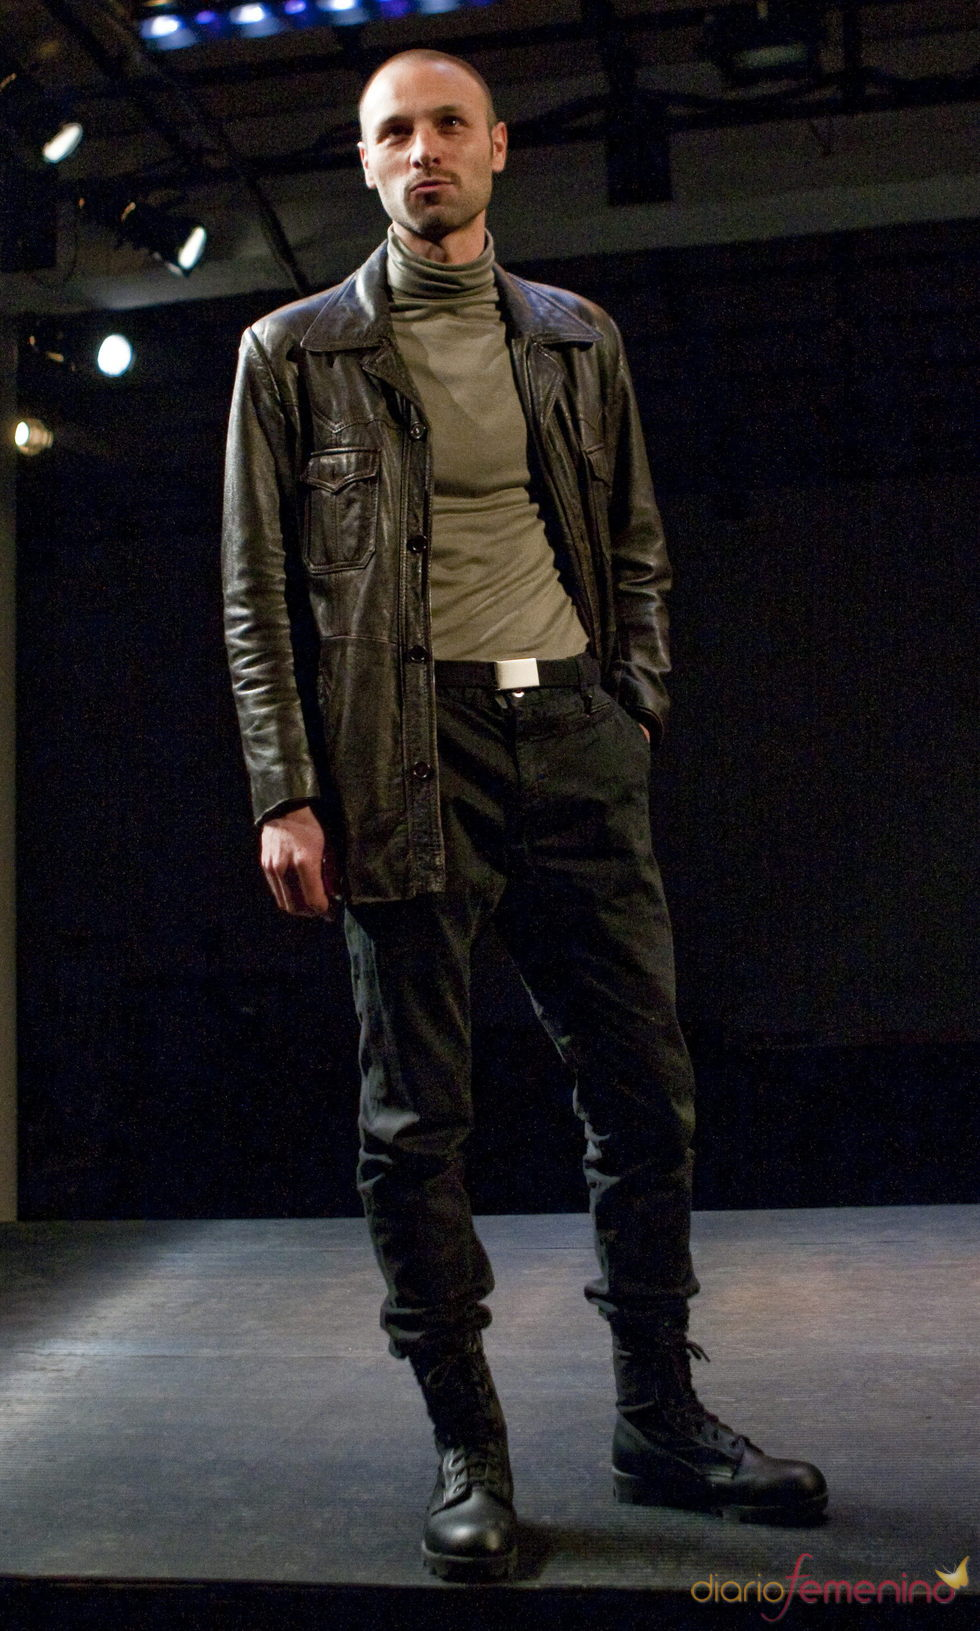 Jordi Brunet actúa en la obra 'Macbeth'